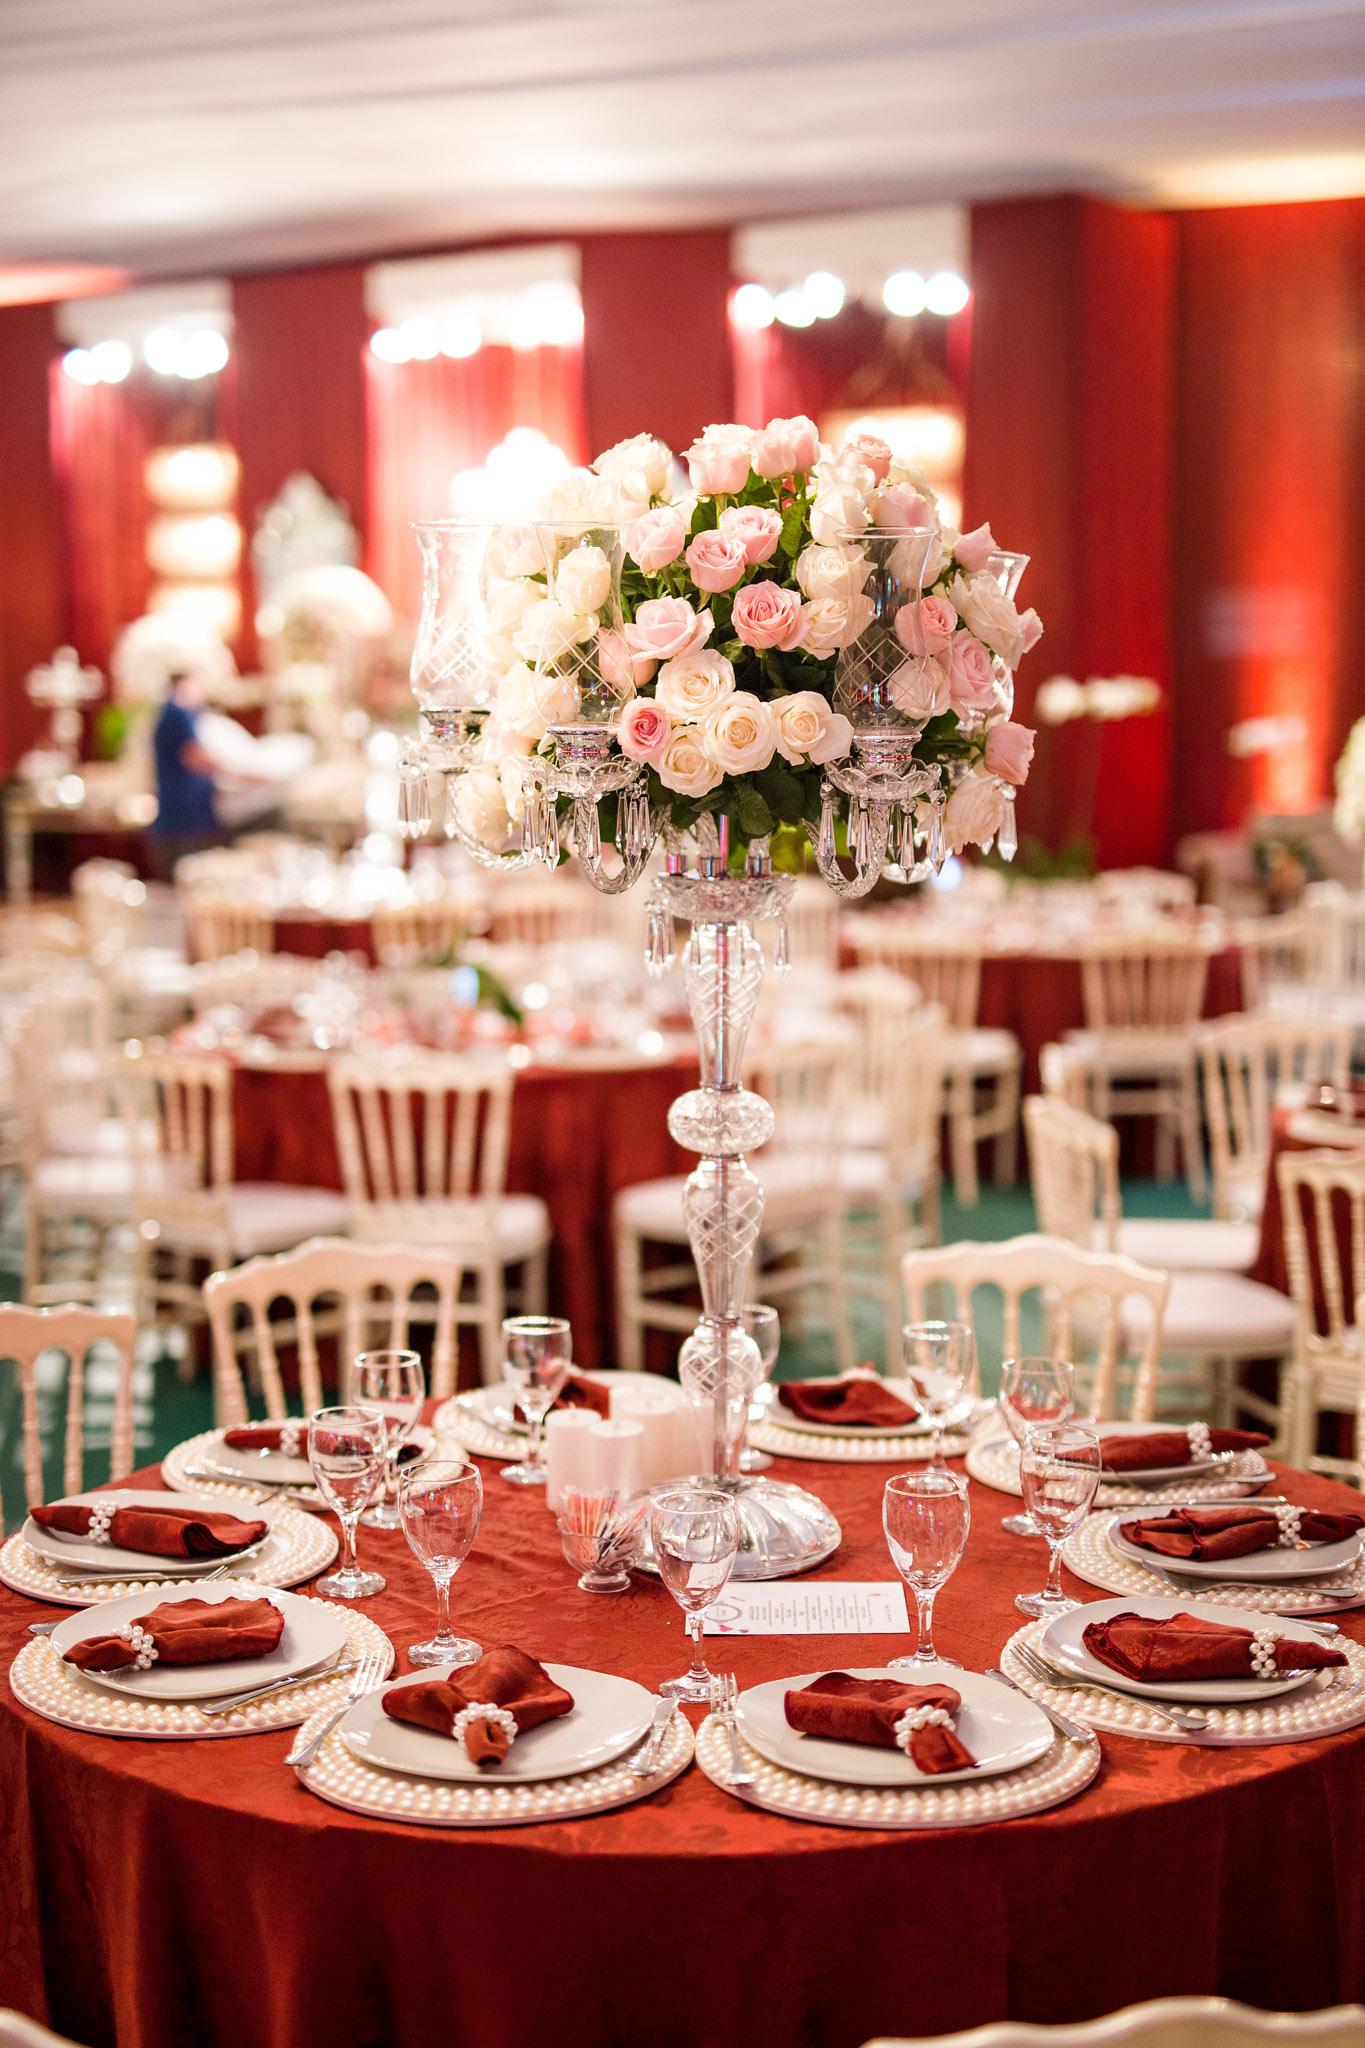 Wedding_Travellers_Destination_Wedding_Photography-174.jpg